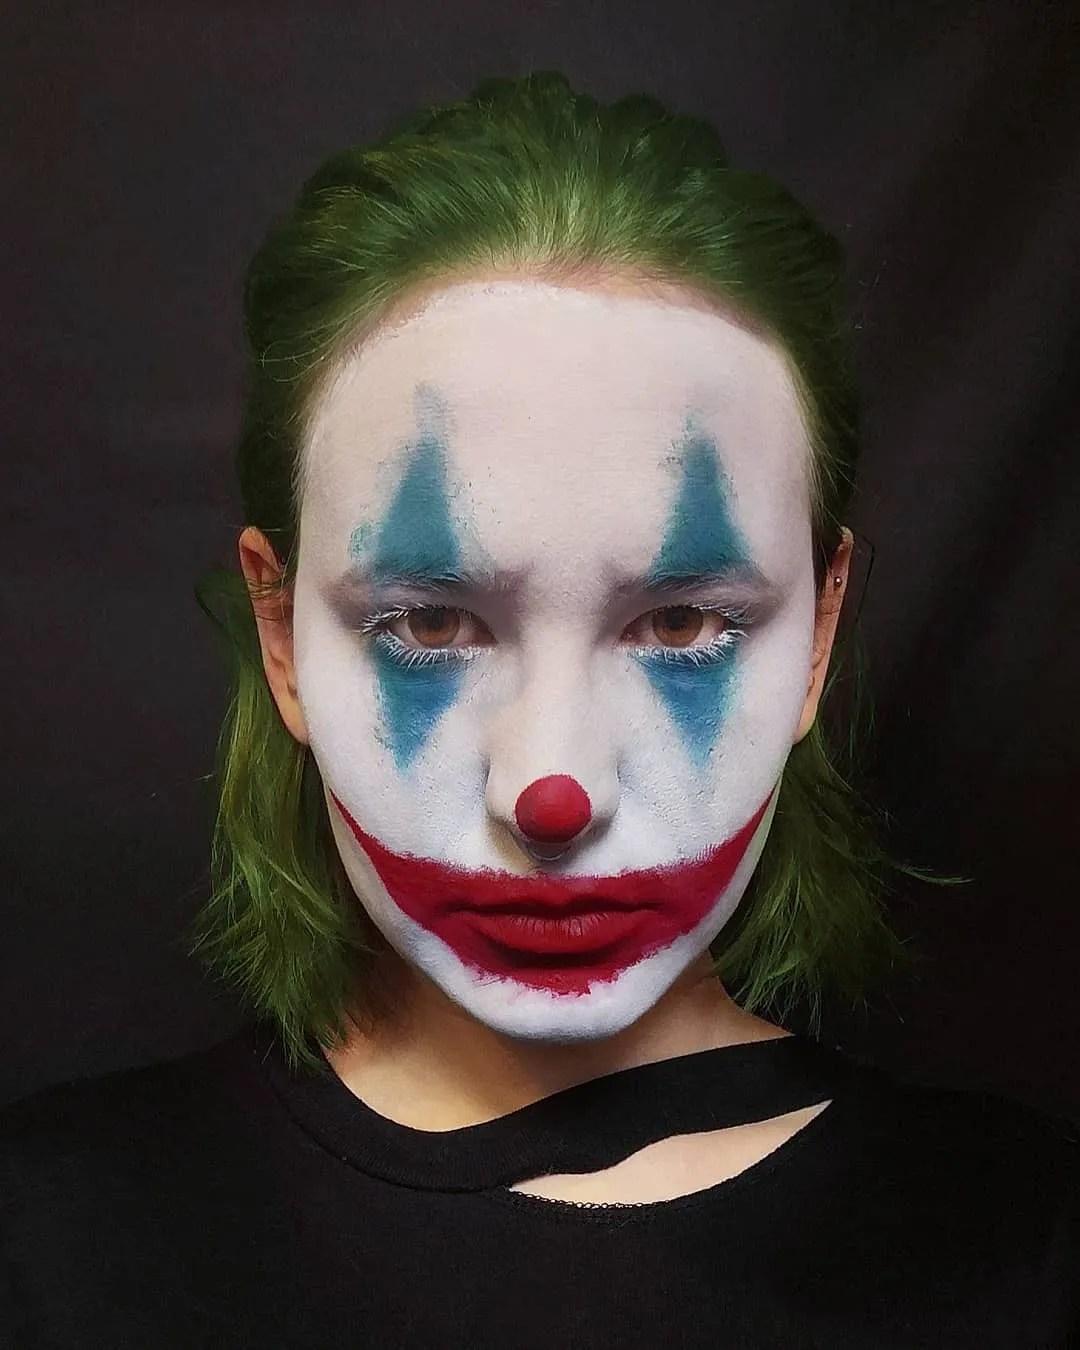 Clown Face Paint Ideas : clown, paint, ideas, Halloween, Makeup, Ideas, Instagram, Glamour